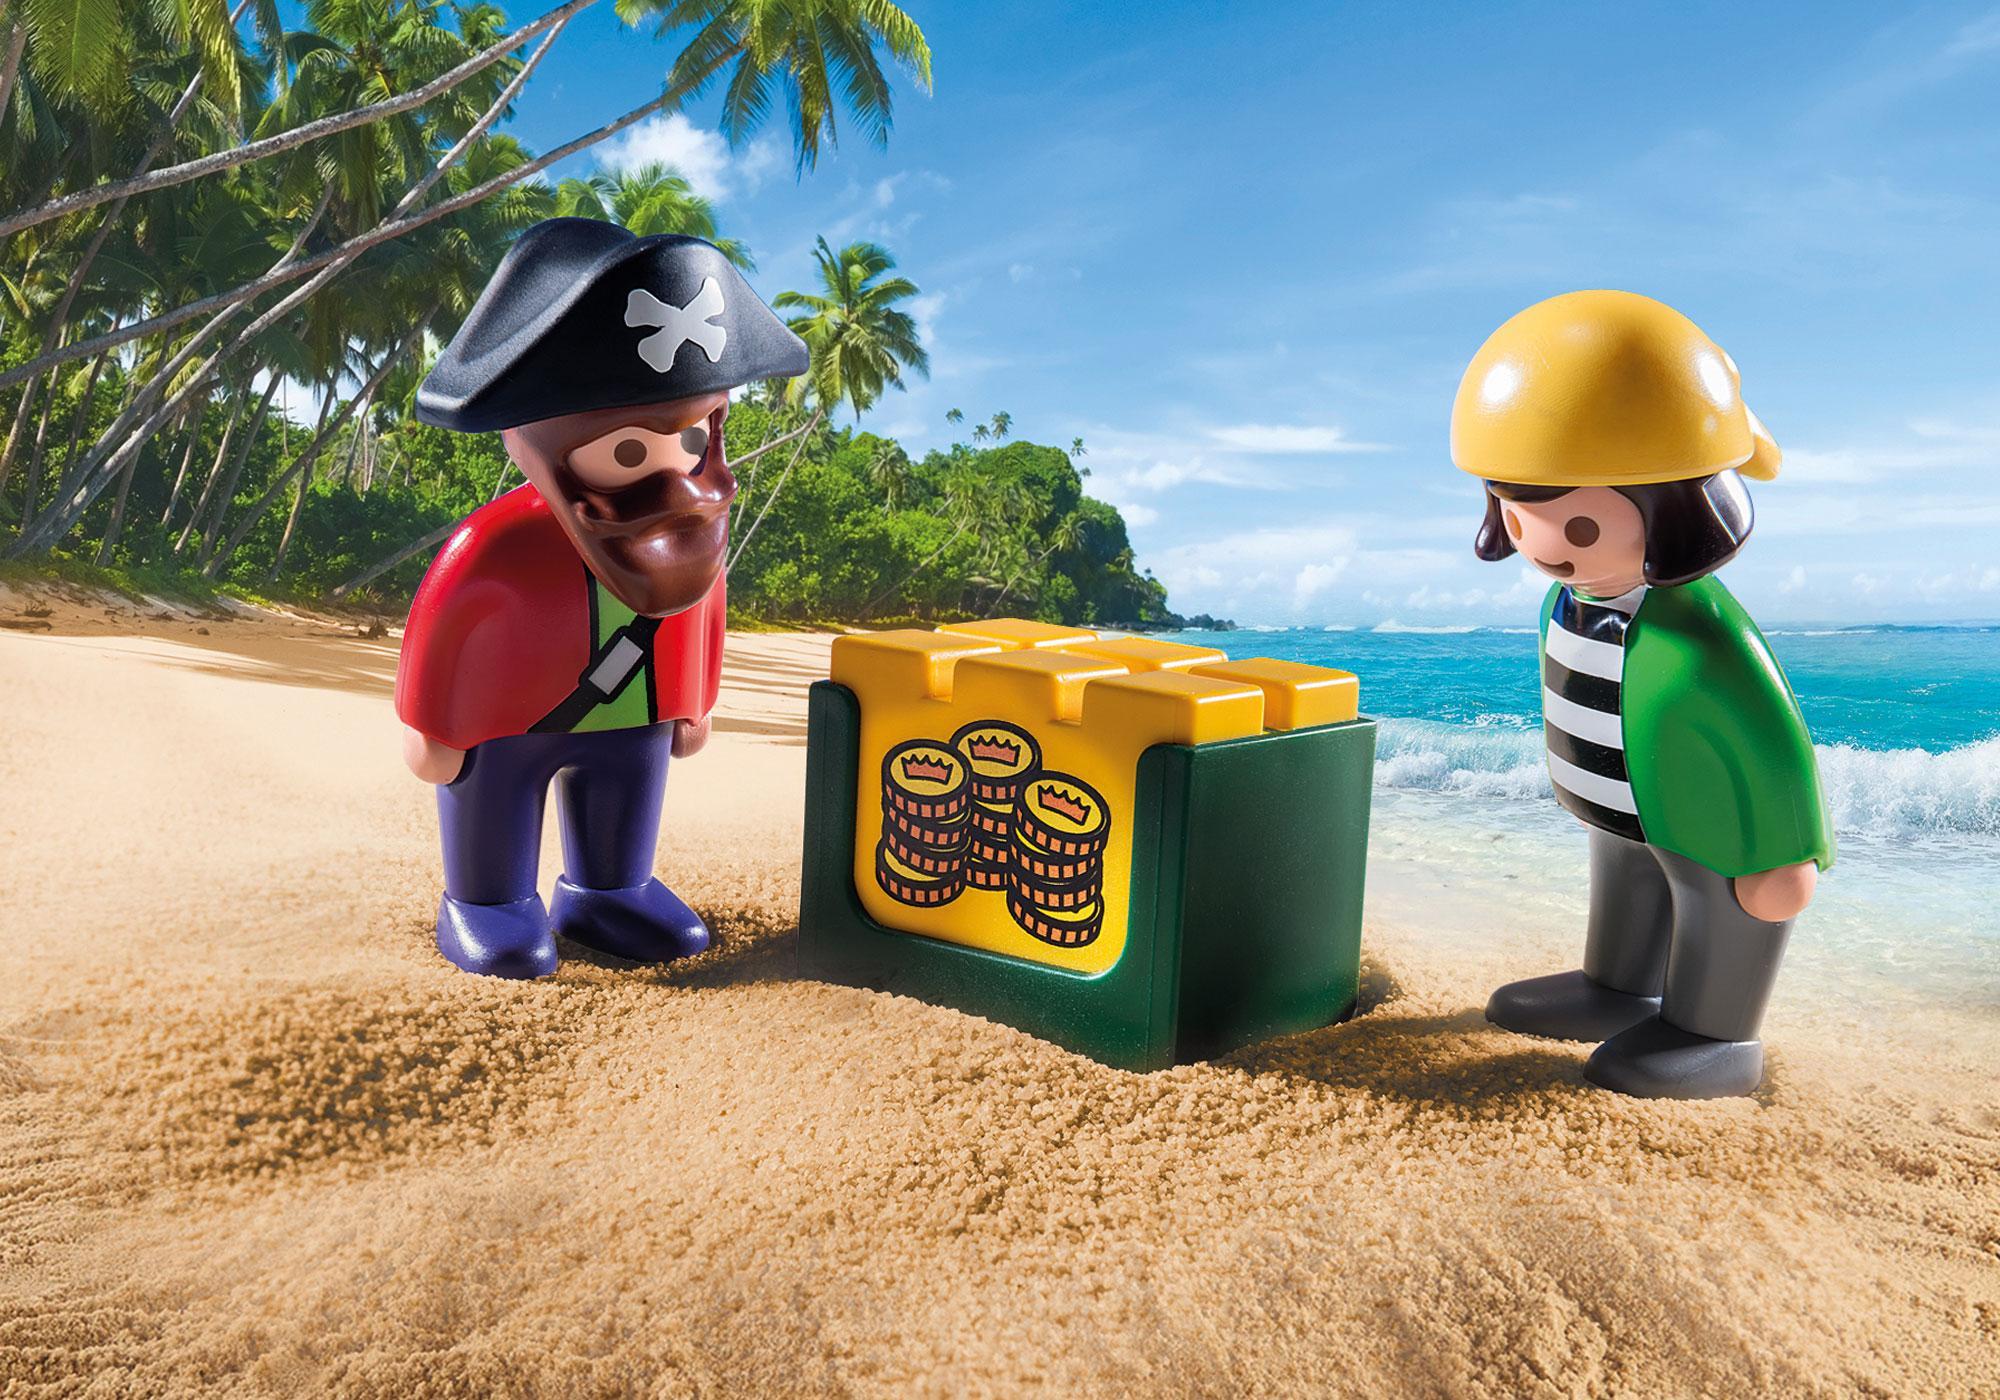 http://media.playmobil.com/i/playmobil/9118_product_extra1/Pirate Ship